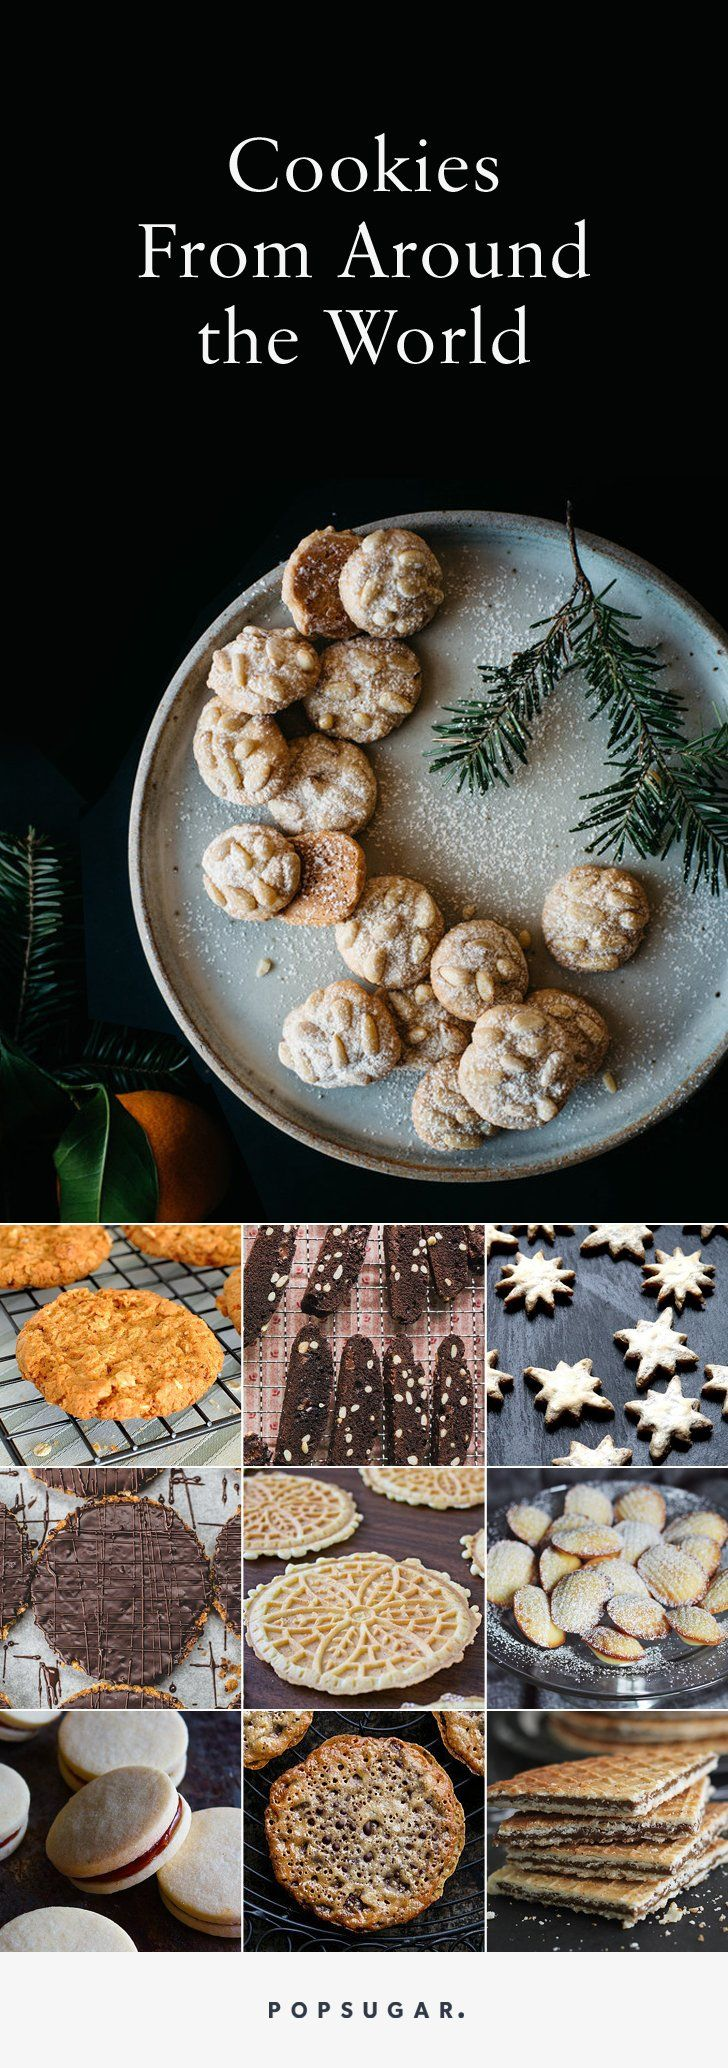 Alfajores, pizzelle, madeleines, pfeffernüsse, linzer, and more cookies from around the world.